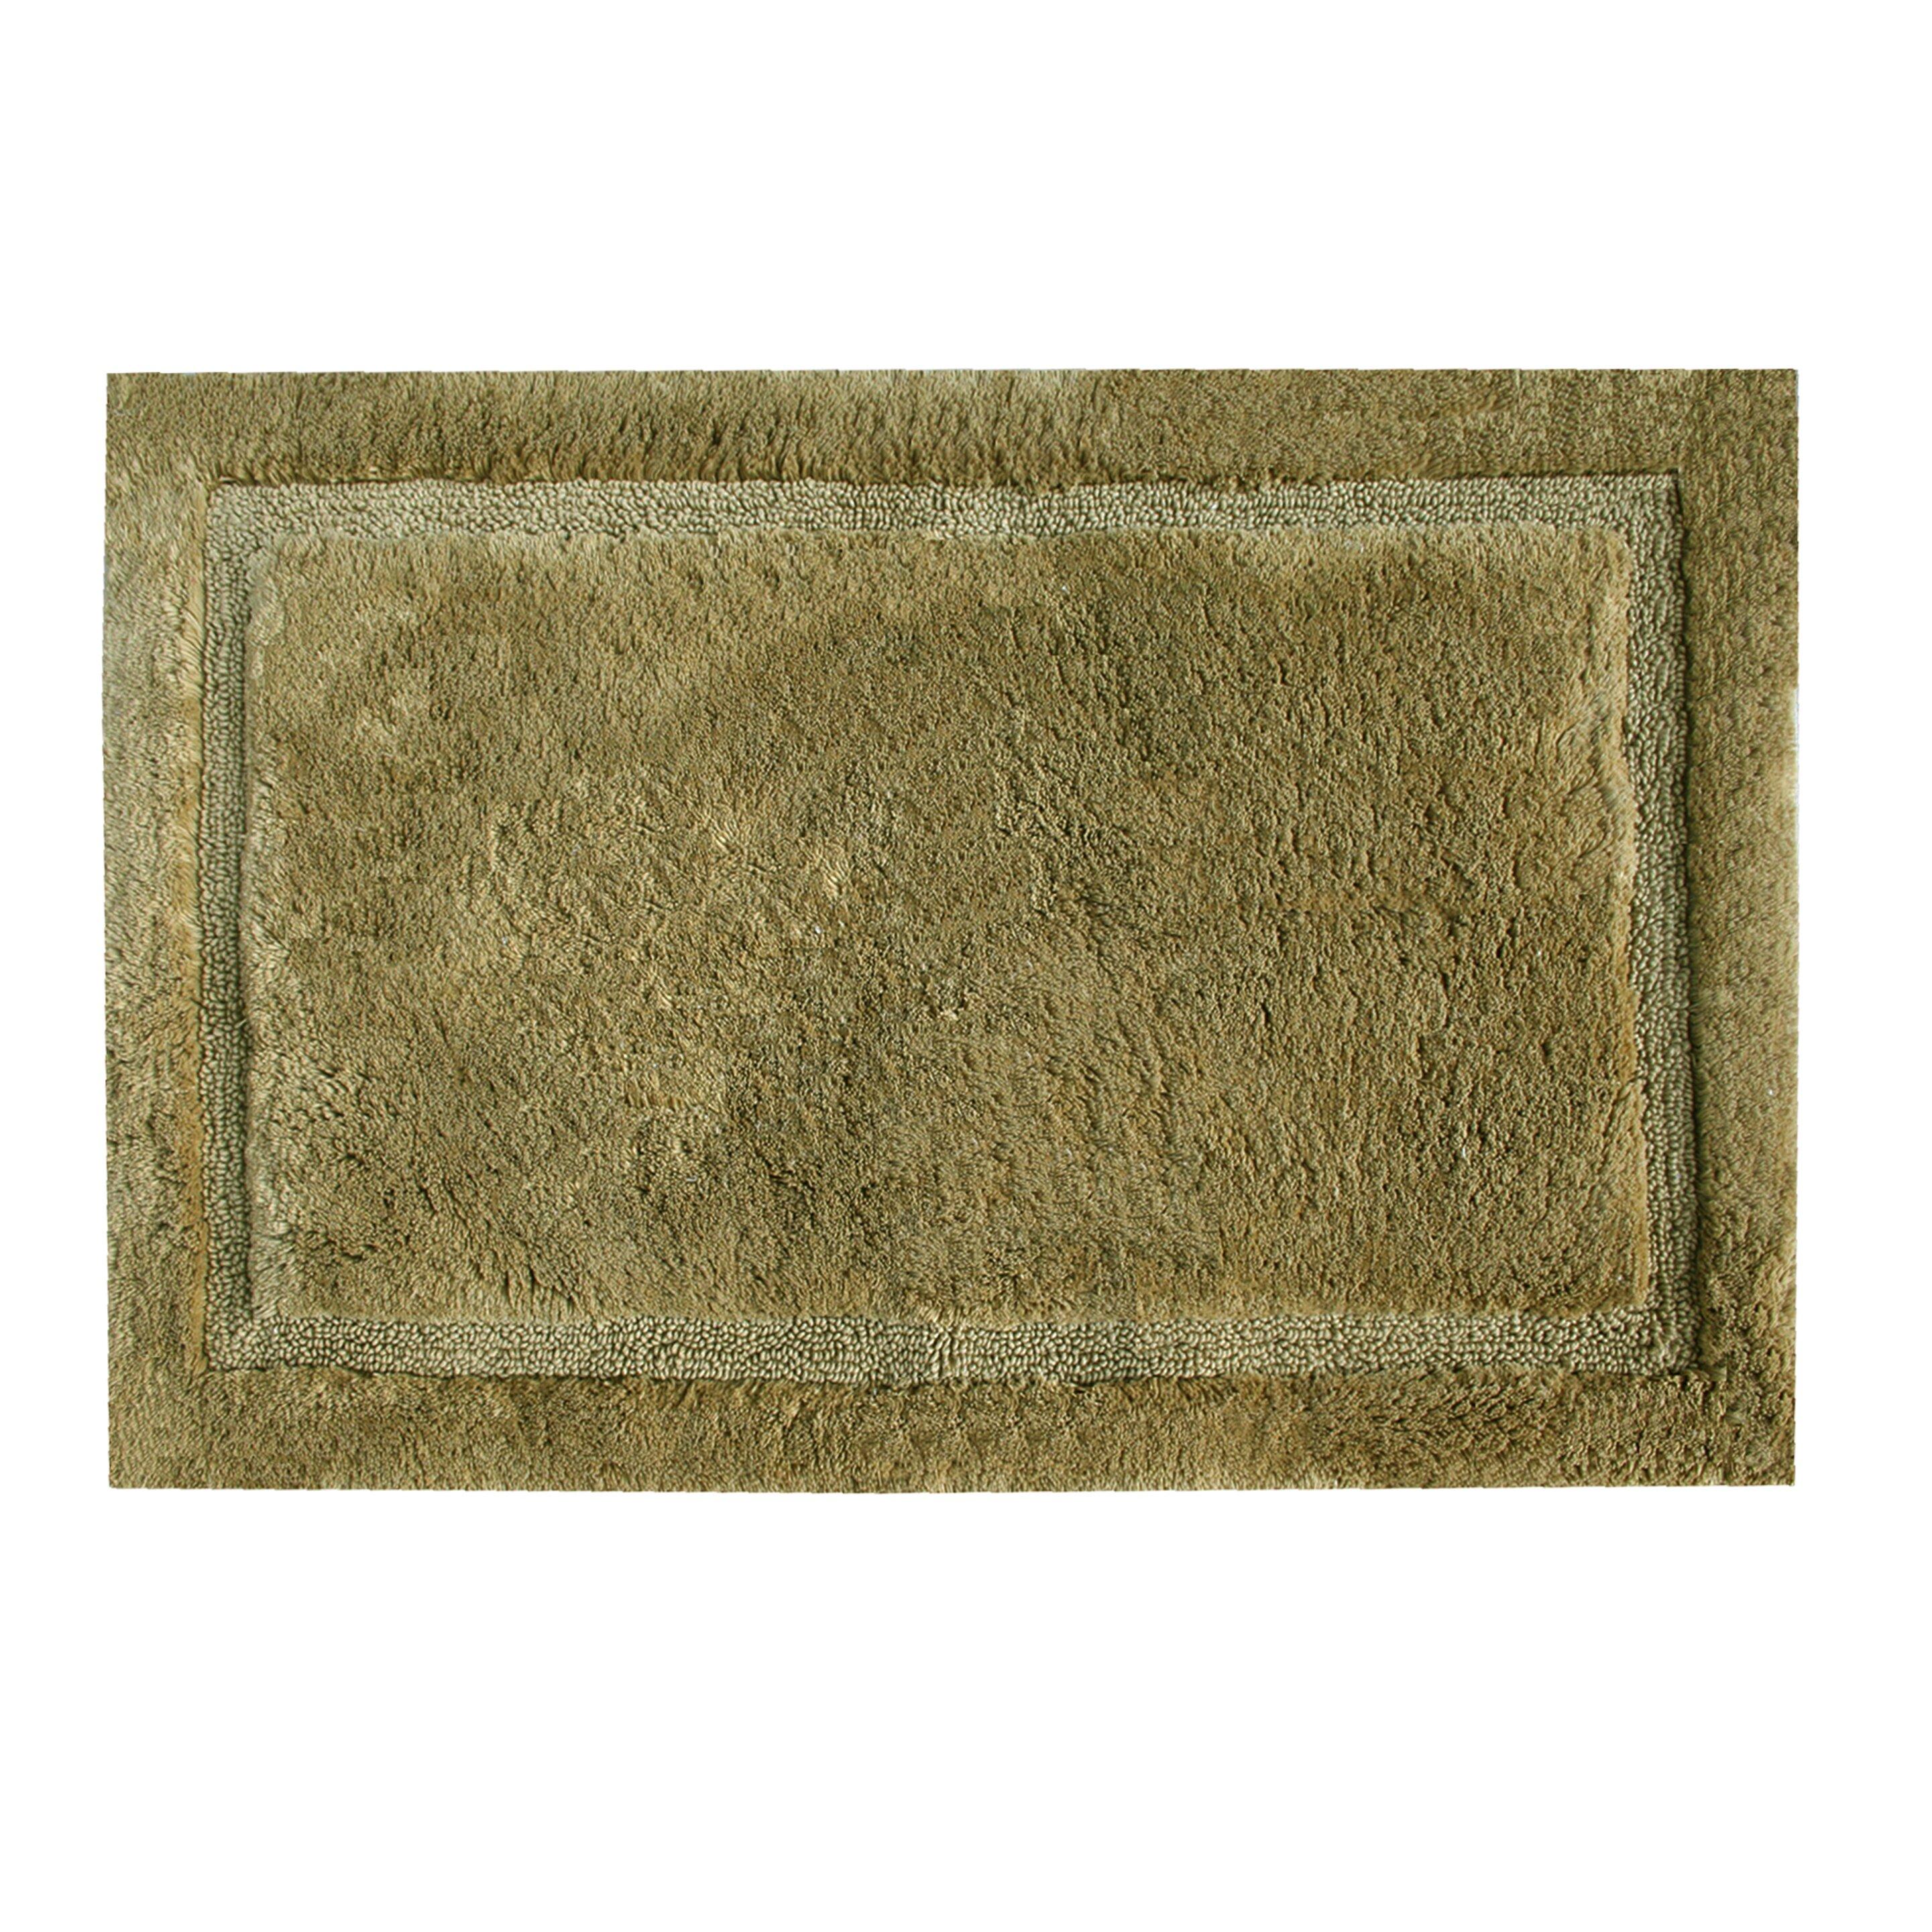 Cotton bathroom rug 100 cotton noodle design bathroom for International decor bath rugs